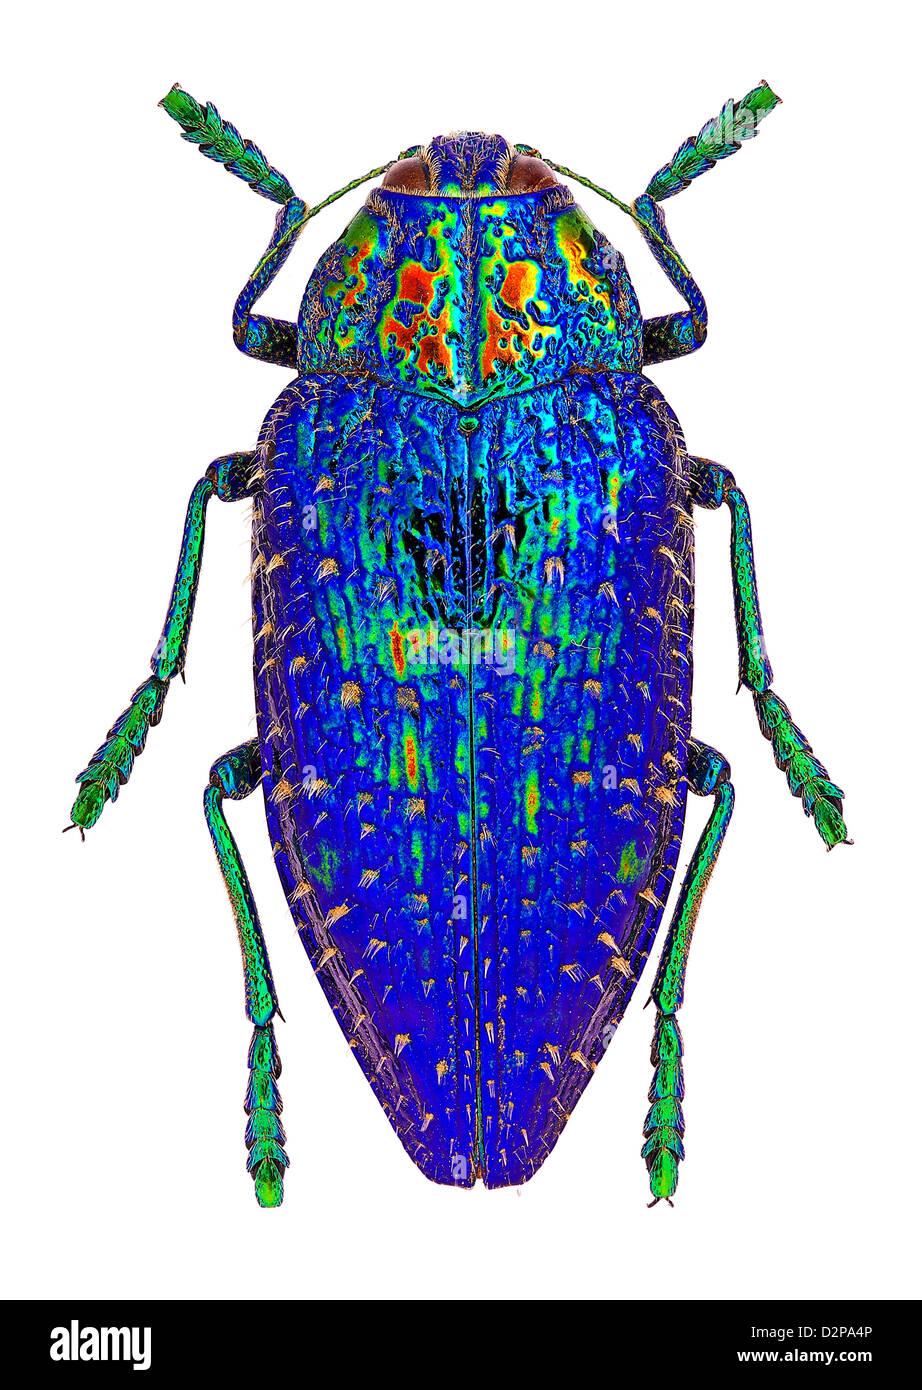 Polybothris sumptuosa gema, a beautifl Jewel beetle (Buprestidae) from Madagascar - Stock Image